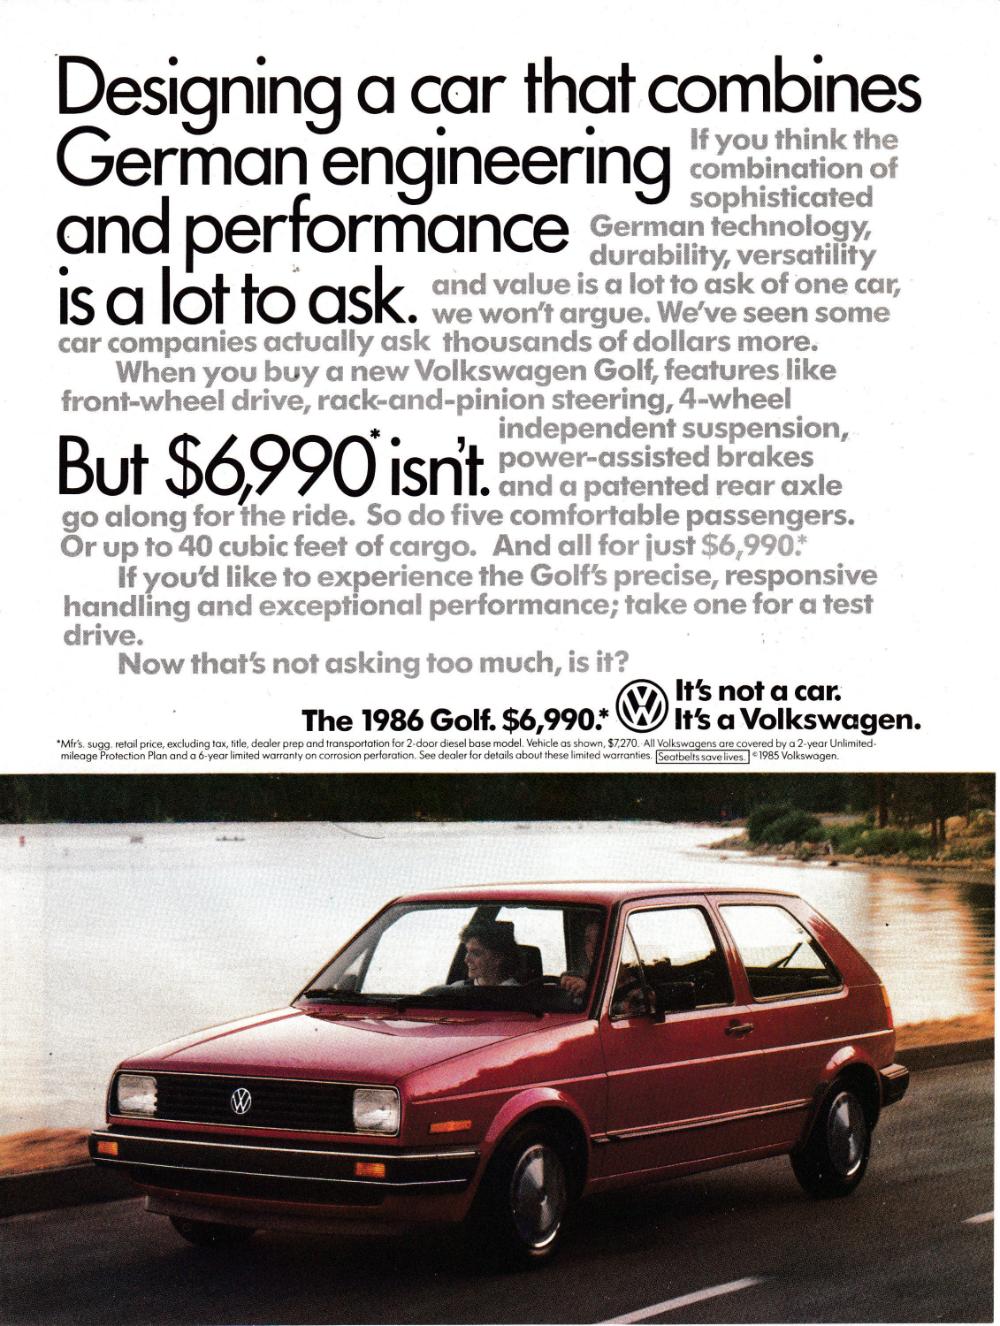 1986 Vw Golf Red Volkswagen Cost 6990 Original Magazine Etsy Volkswagen Classic Cars Vw Golf